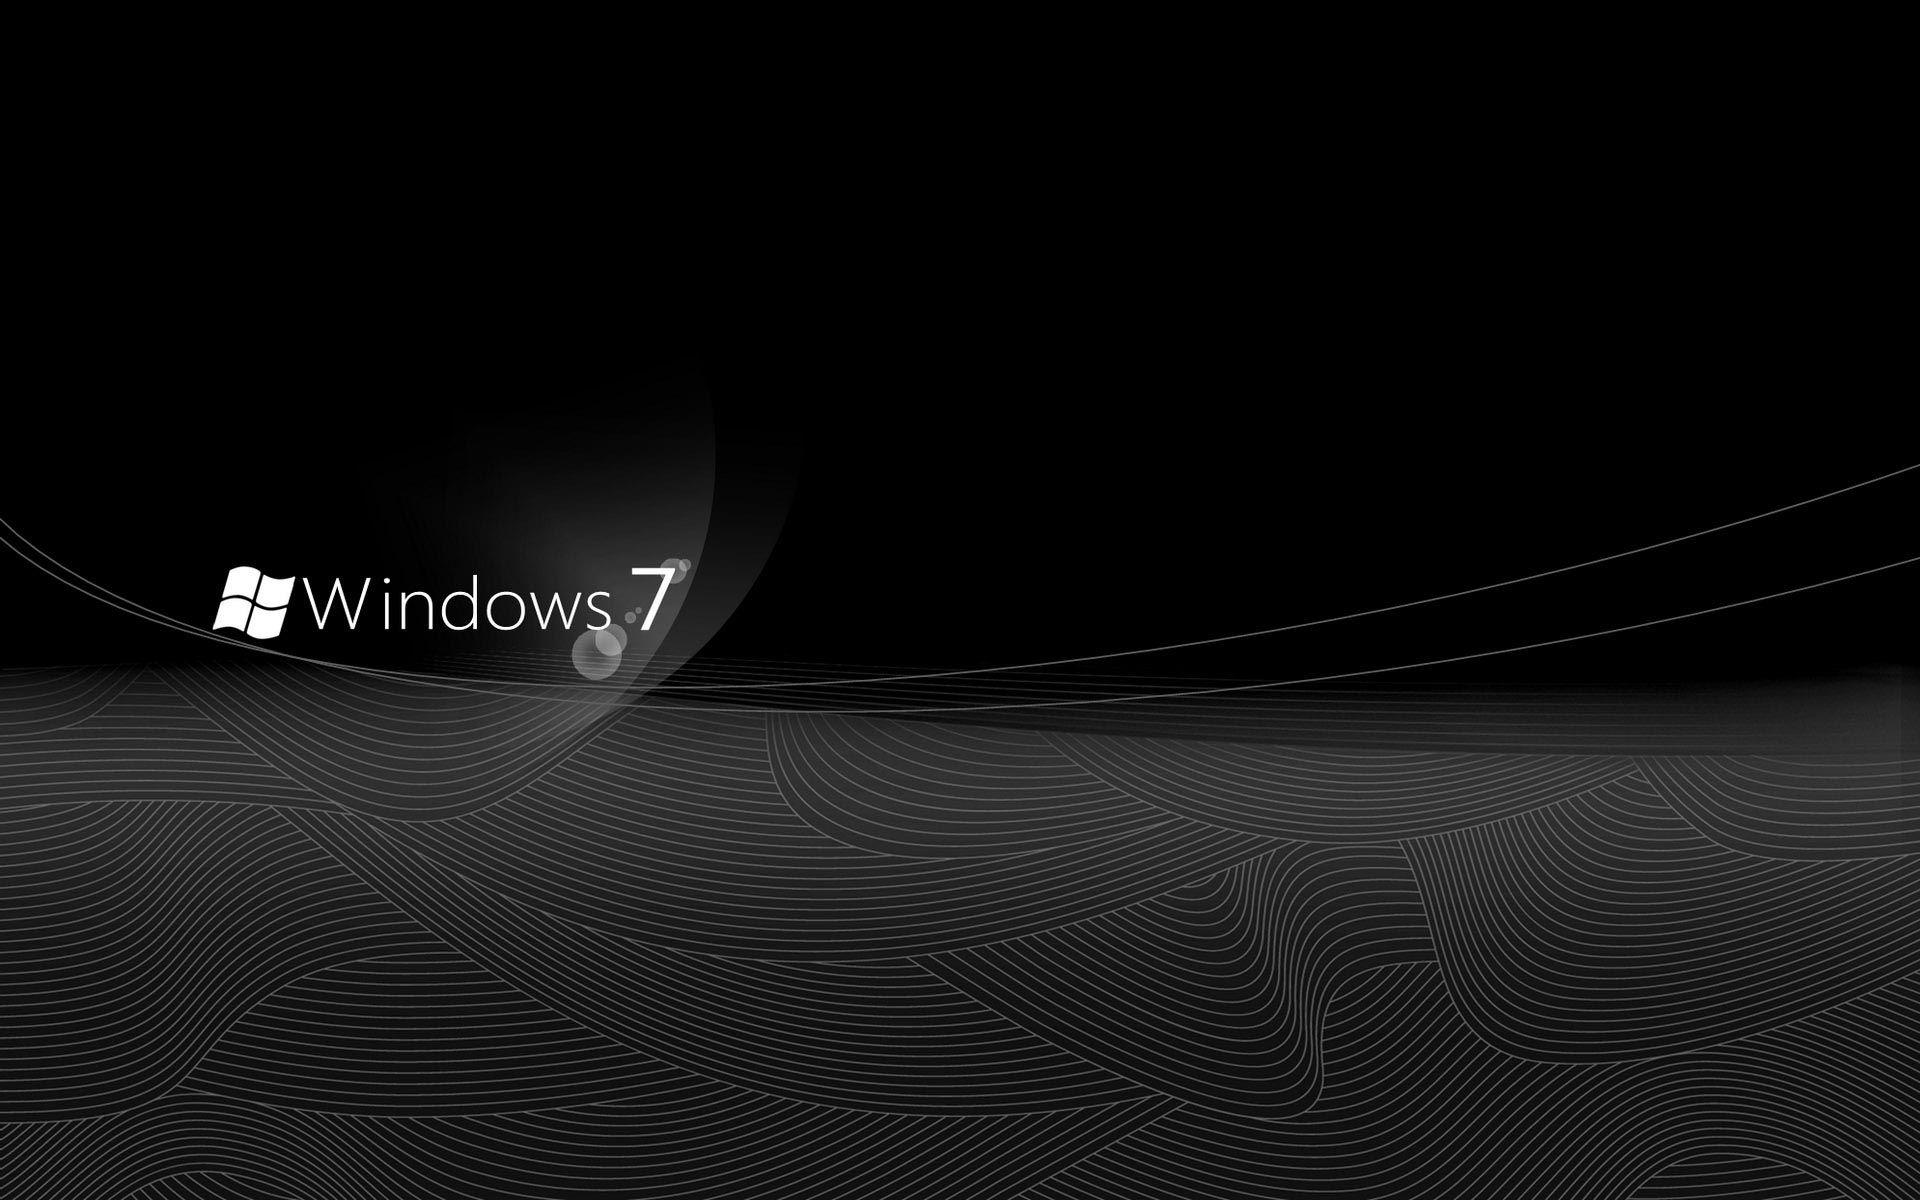 Windows 7 Elegant black Desktop Wallpaper Things to Wear in 2019 1920x1200